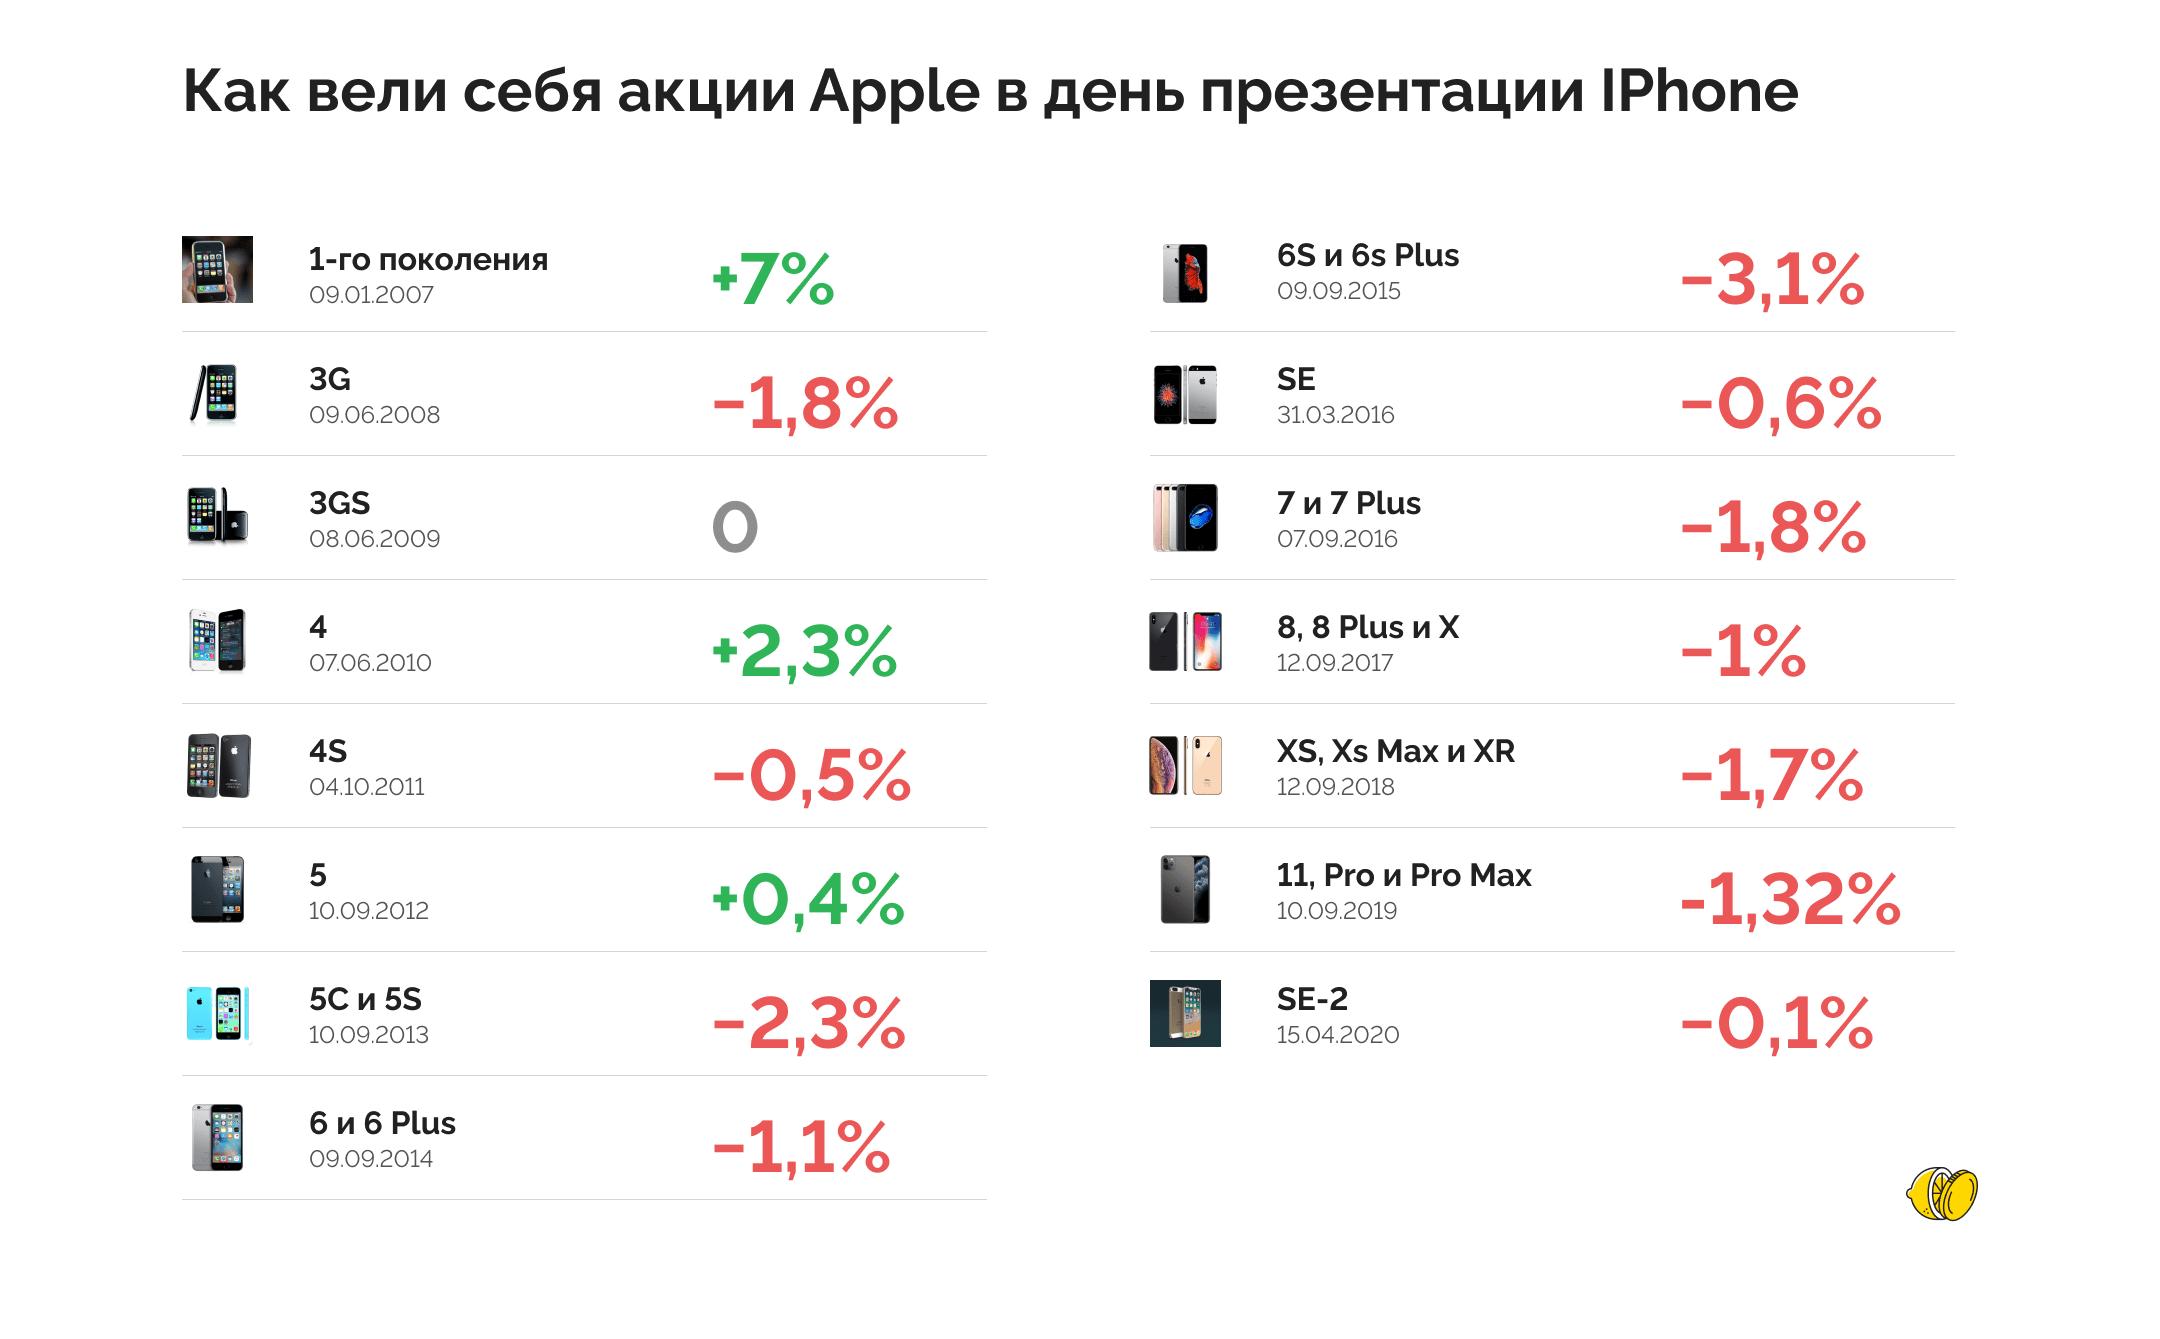 Взлетят ли акции Apple после презентации?